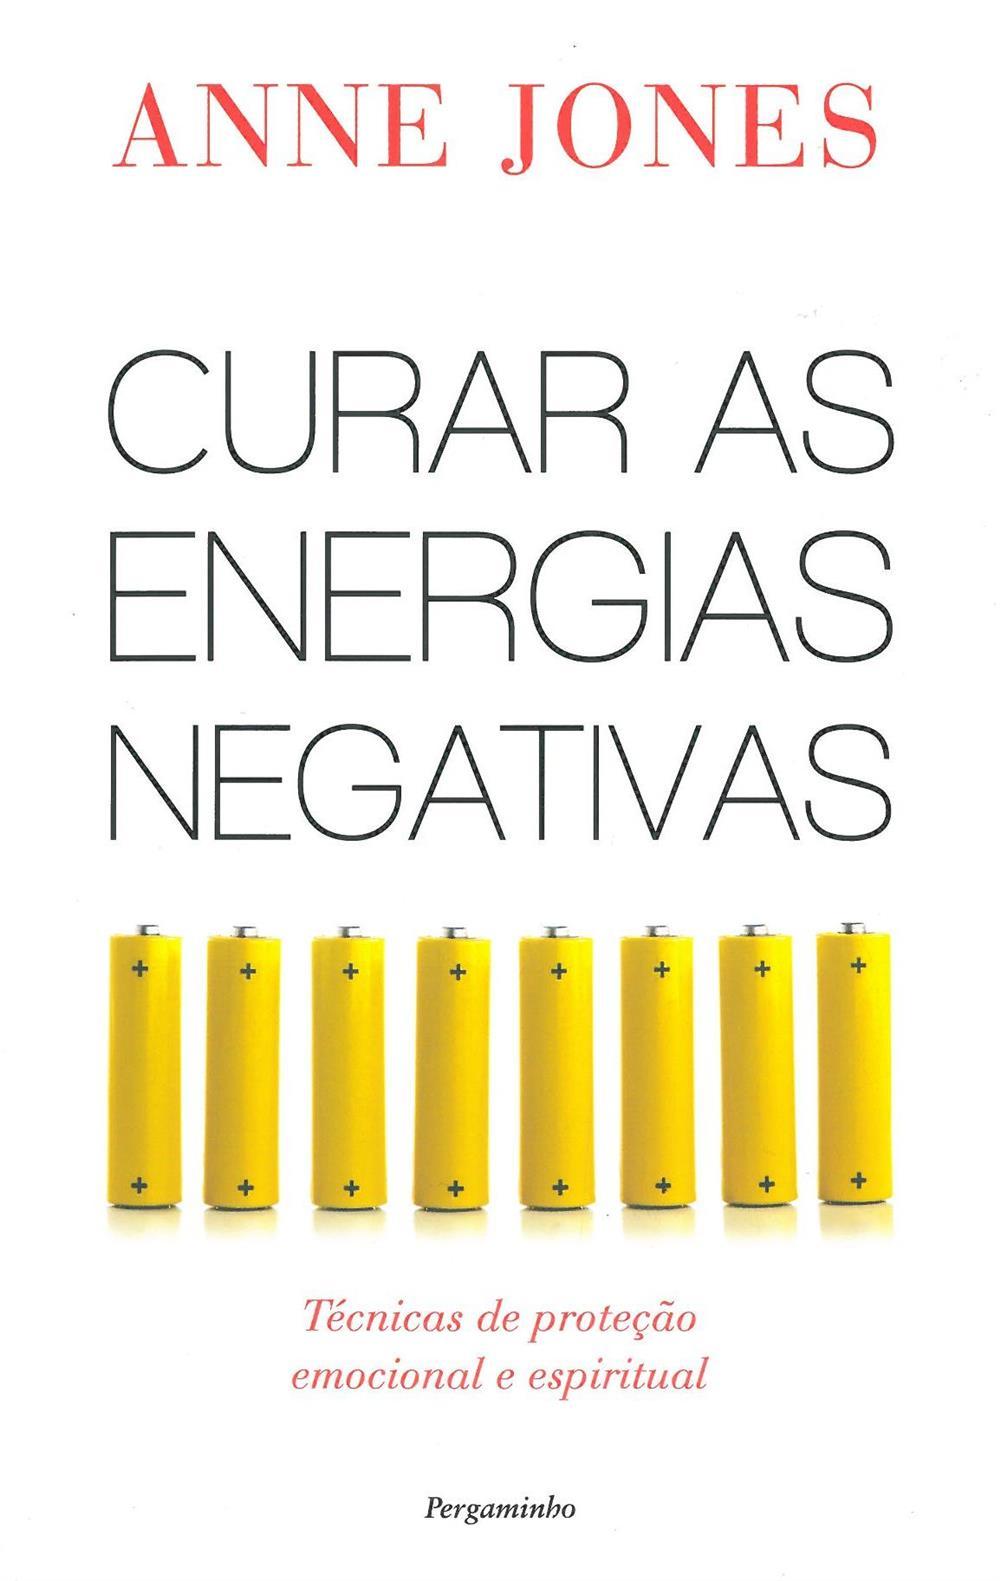 Curar as energias negativas_.jpg